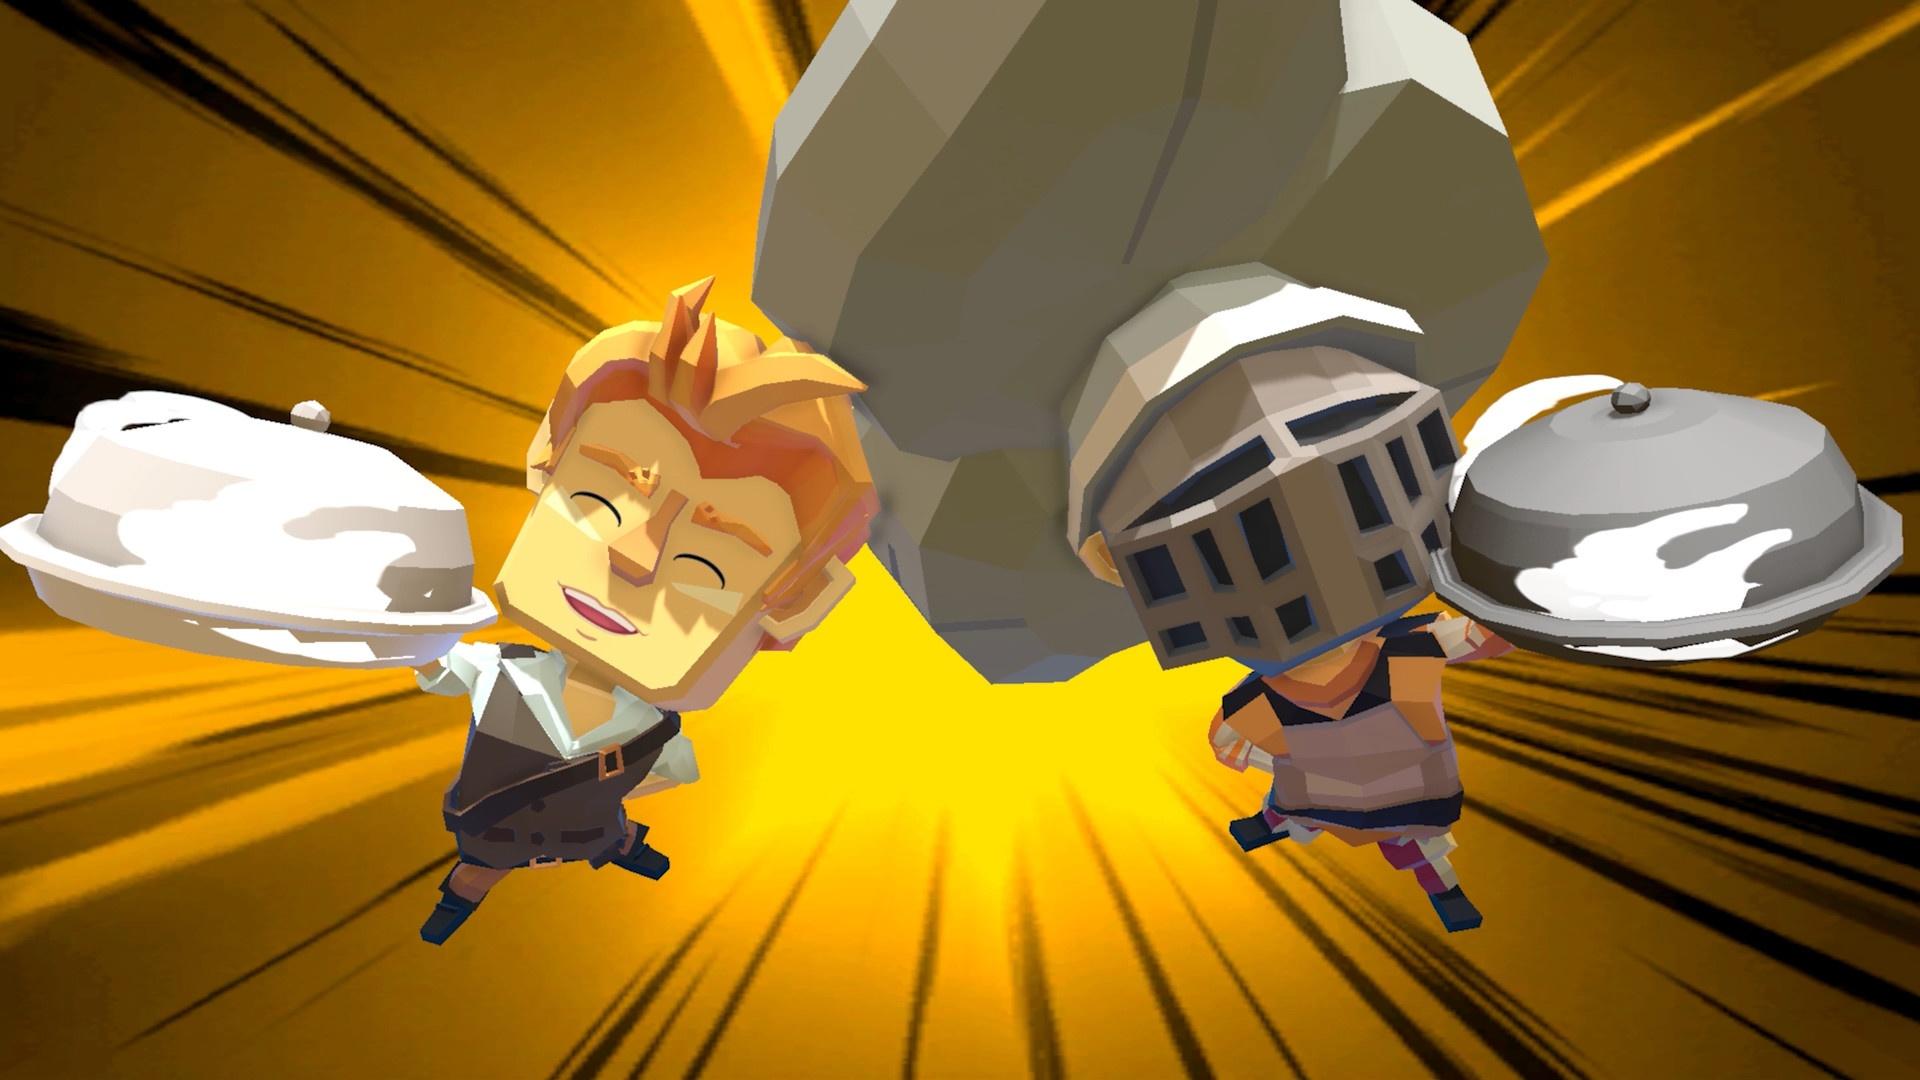 Team17 выпустит симулятор Epic Chef по мотивам книг Терри Пратчетта